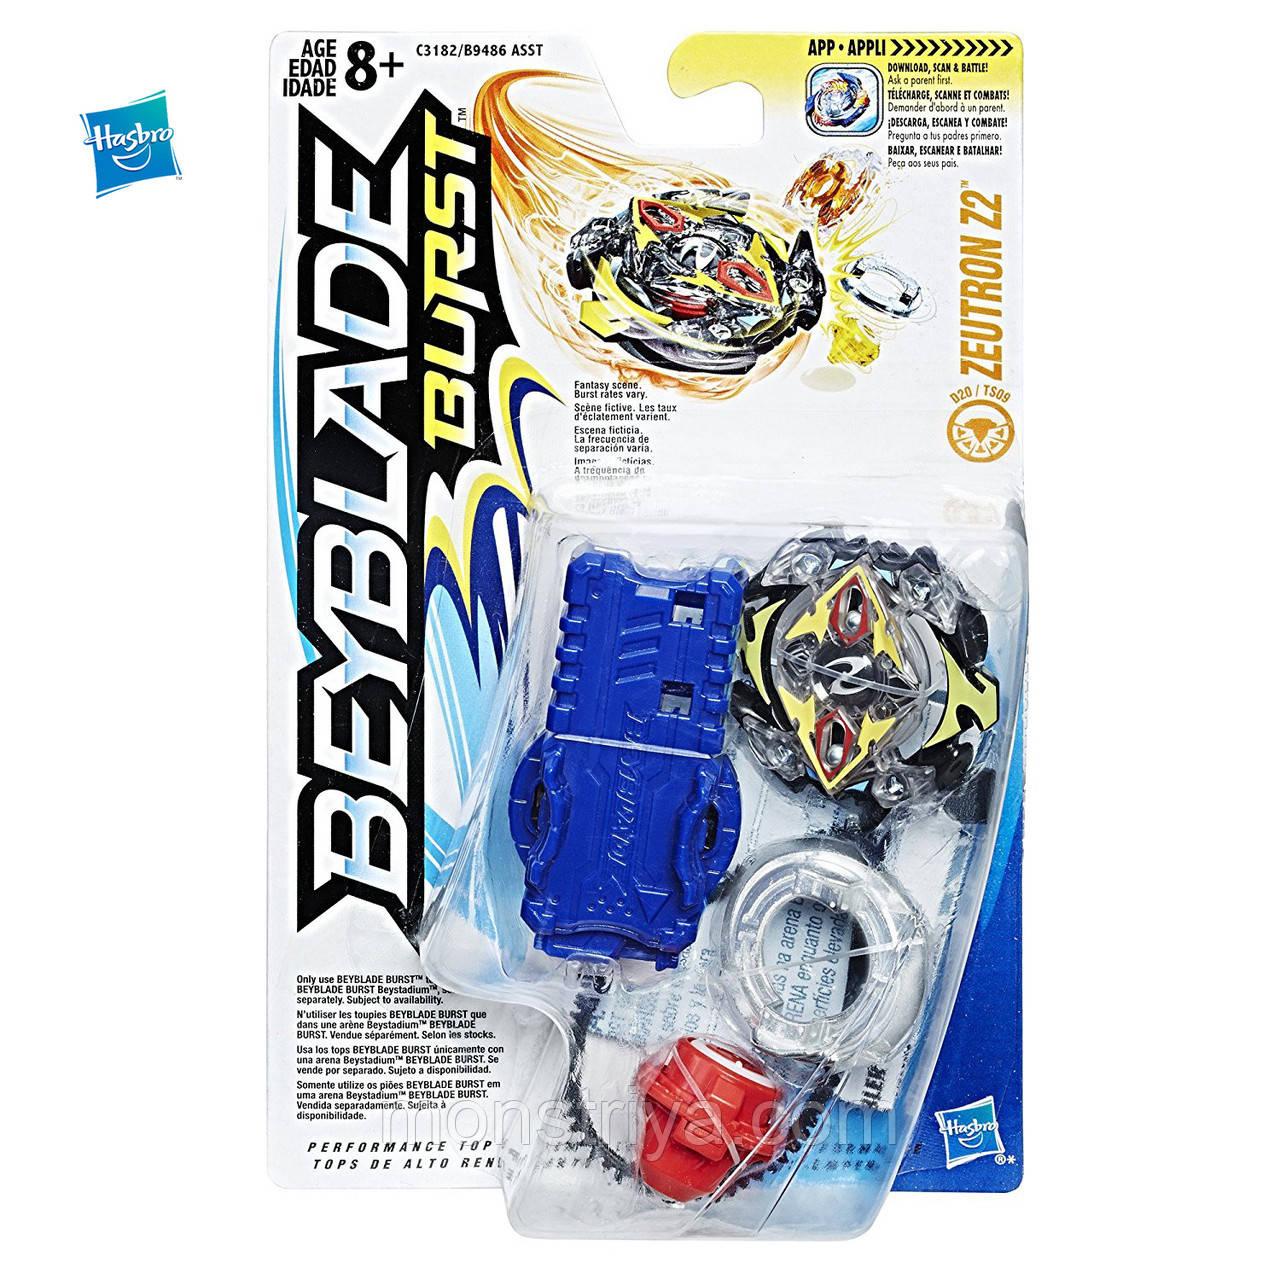 Бейблэйд Вибух волчок Зейтрон с пусковым устройством Beyblade Burst  ZEUTRON Z2